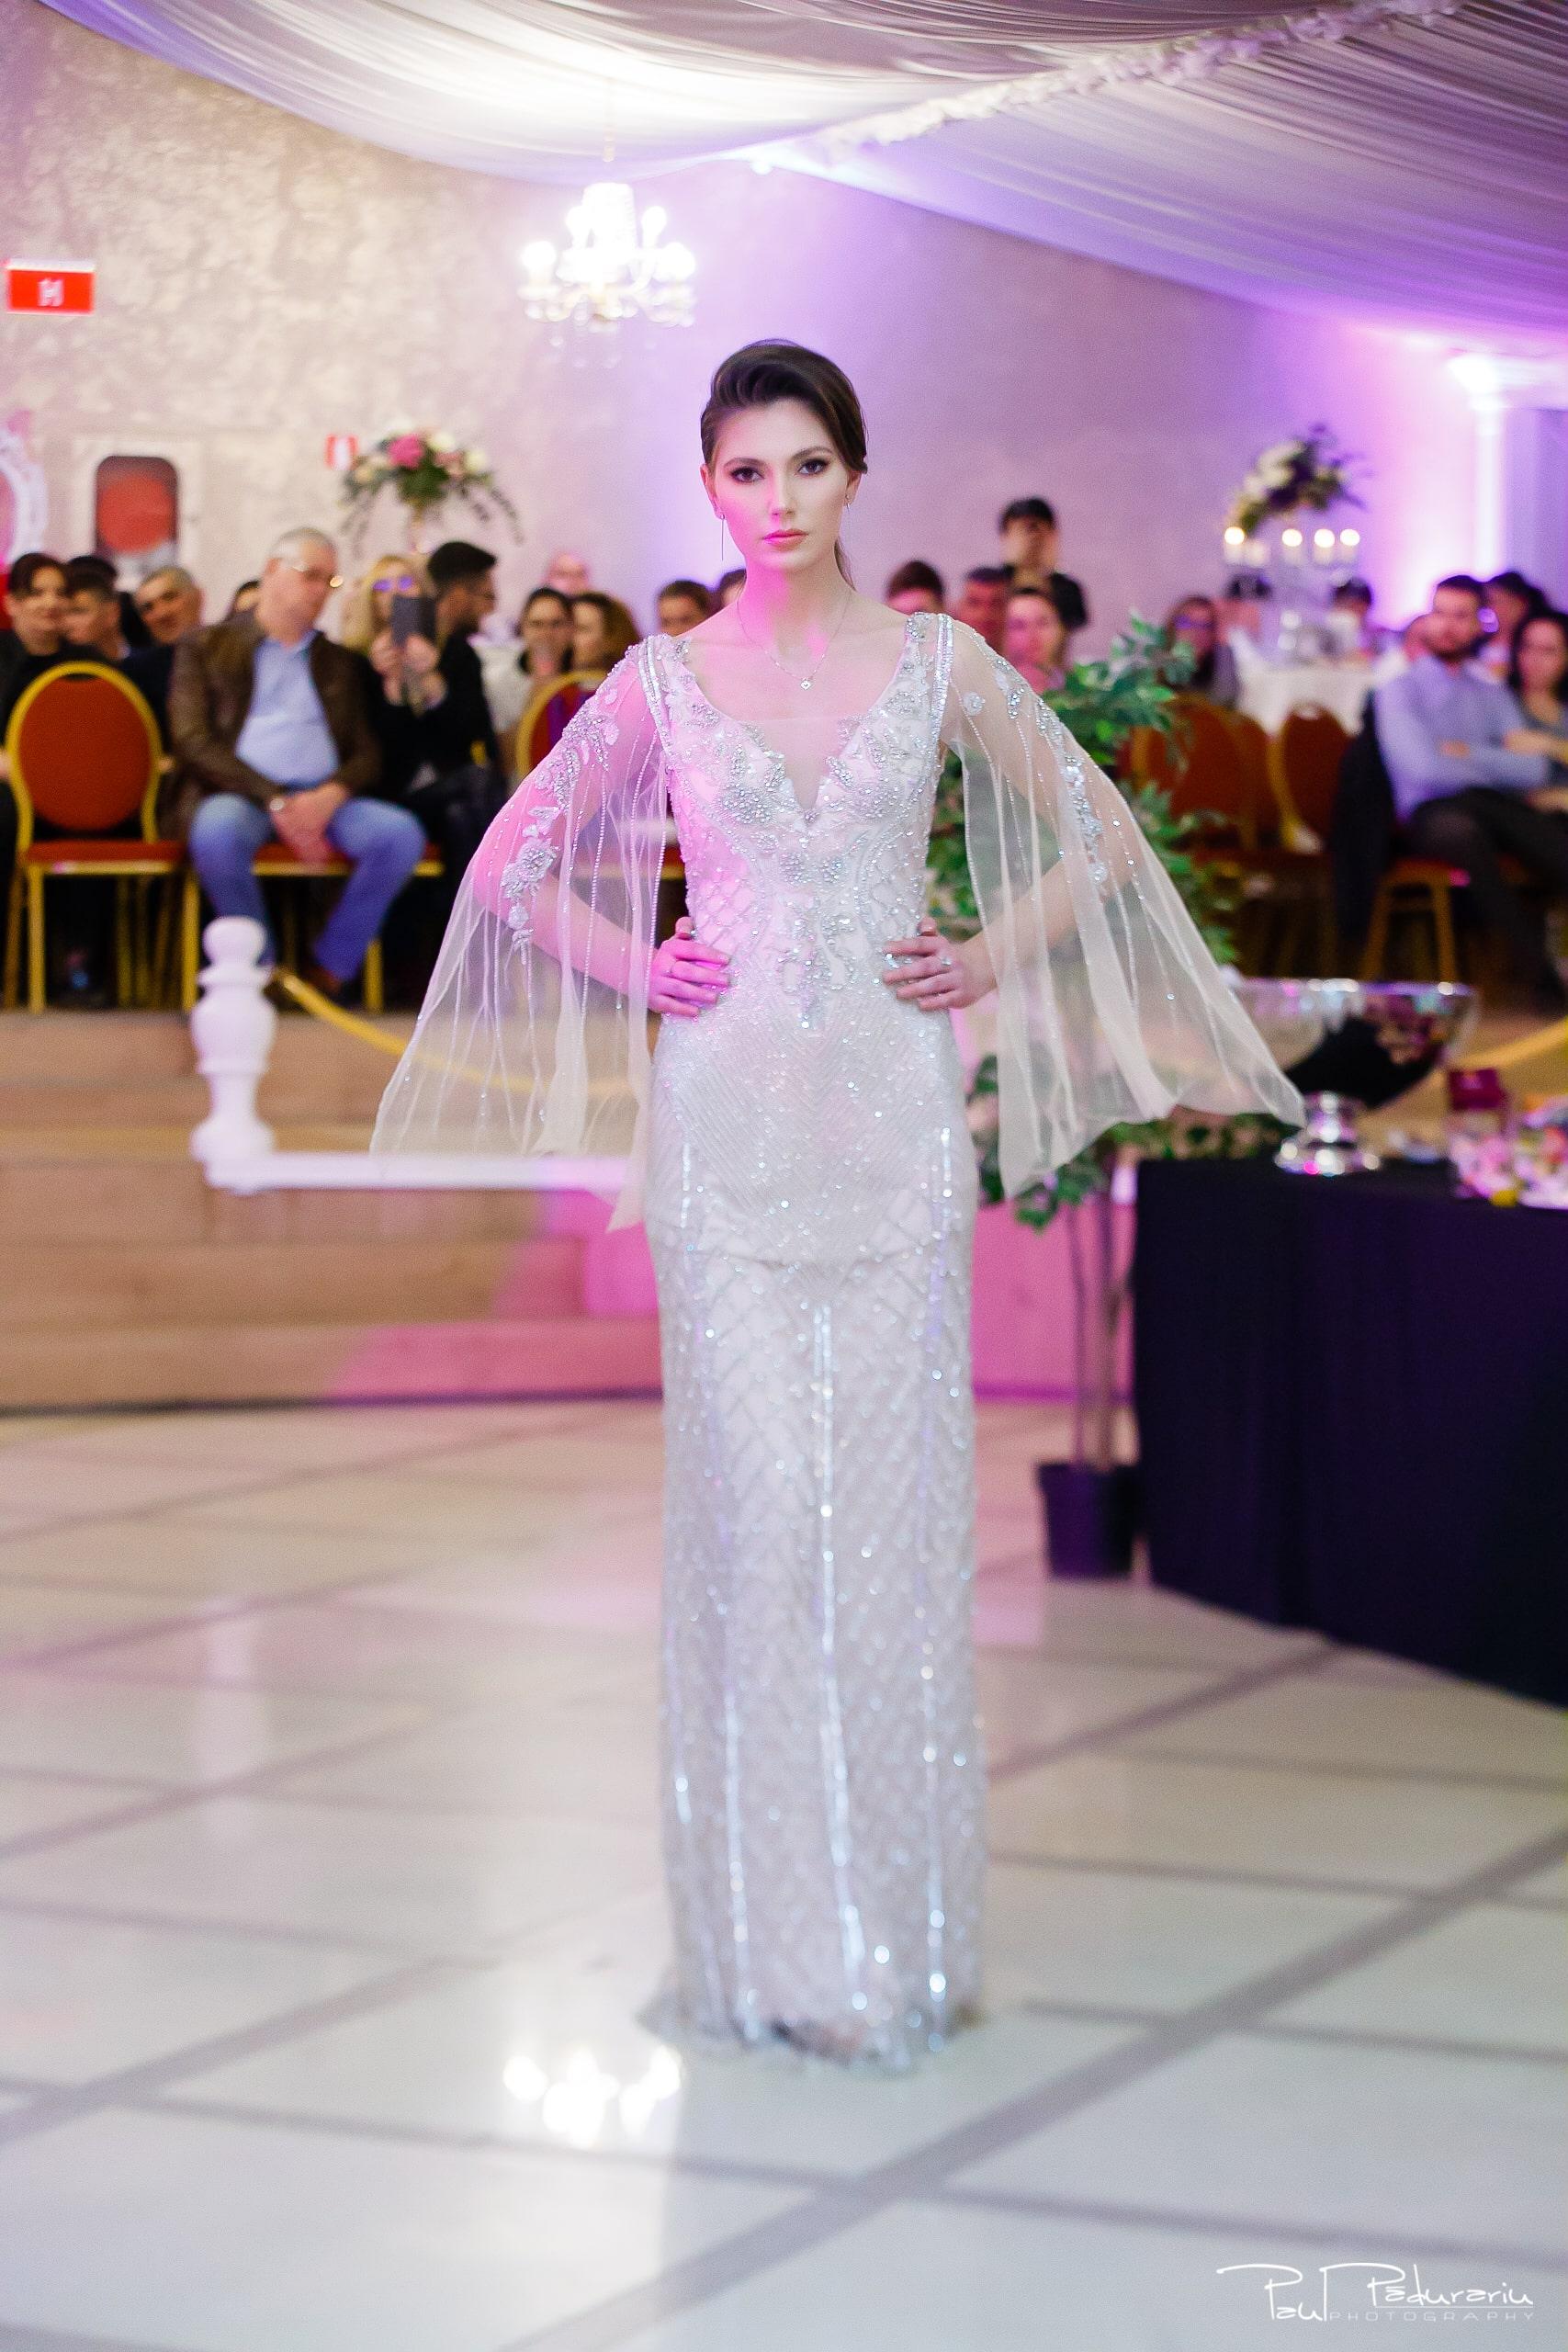 Modern Bride Edith Val colectie rochie mireasa 2019 - fotograf profesionist iasi paul padurariu | nunta iasi 8